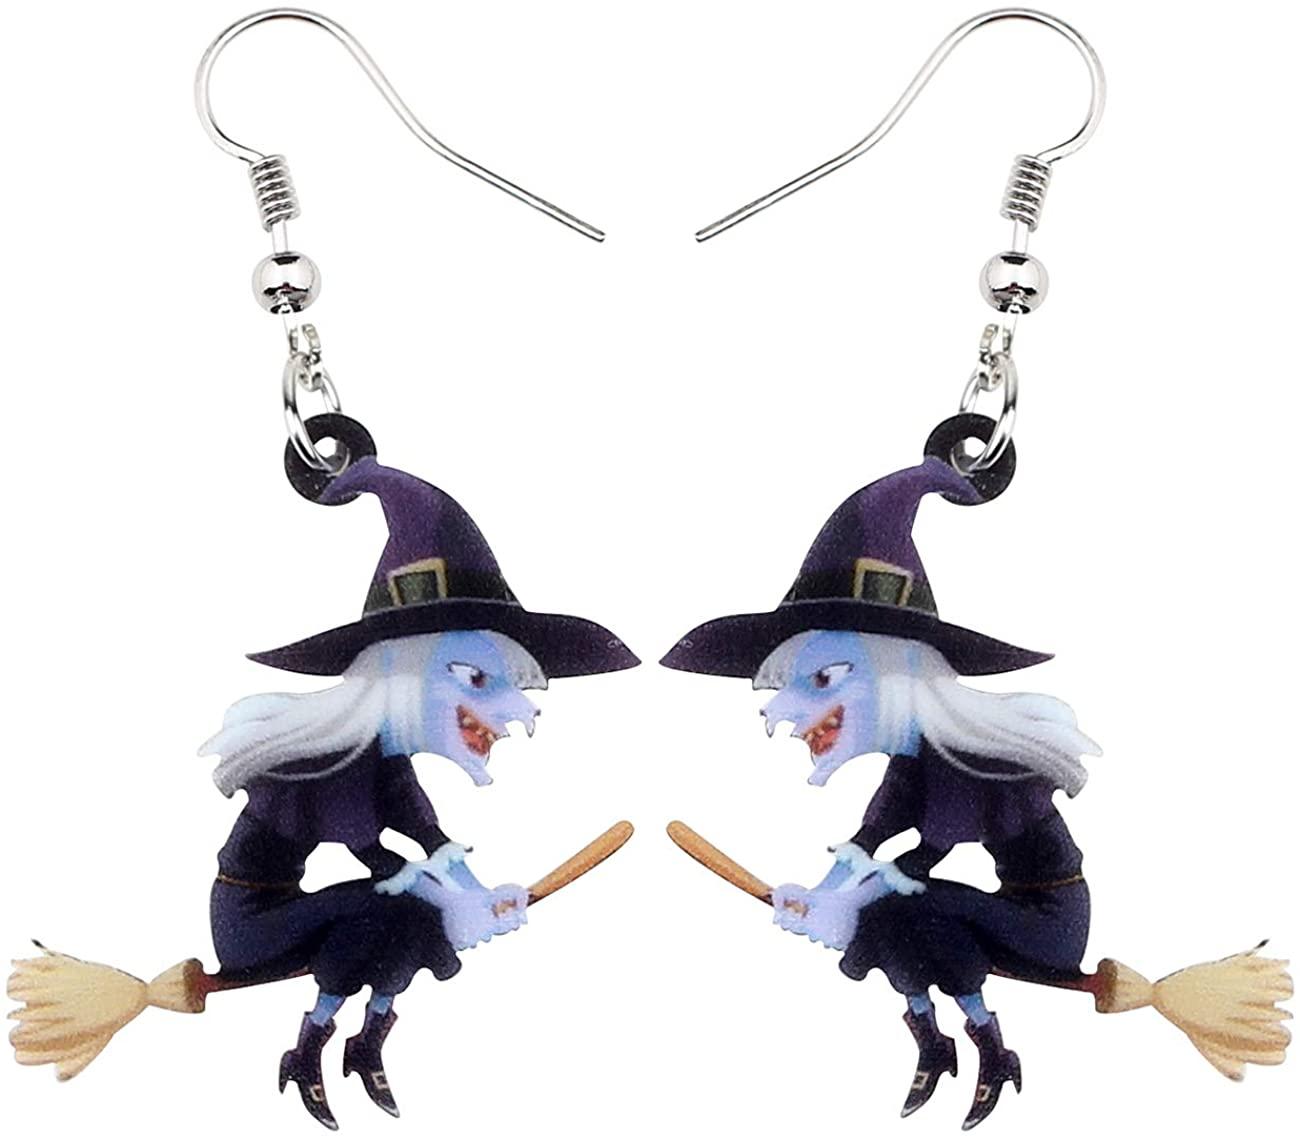 NEWEI Acrylic Animal Sweet Halloween Broomstick Witch Earrings Drop Dangle Fashion Jewelry for Women Girls Teens Gift Charms